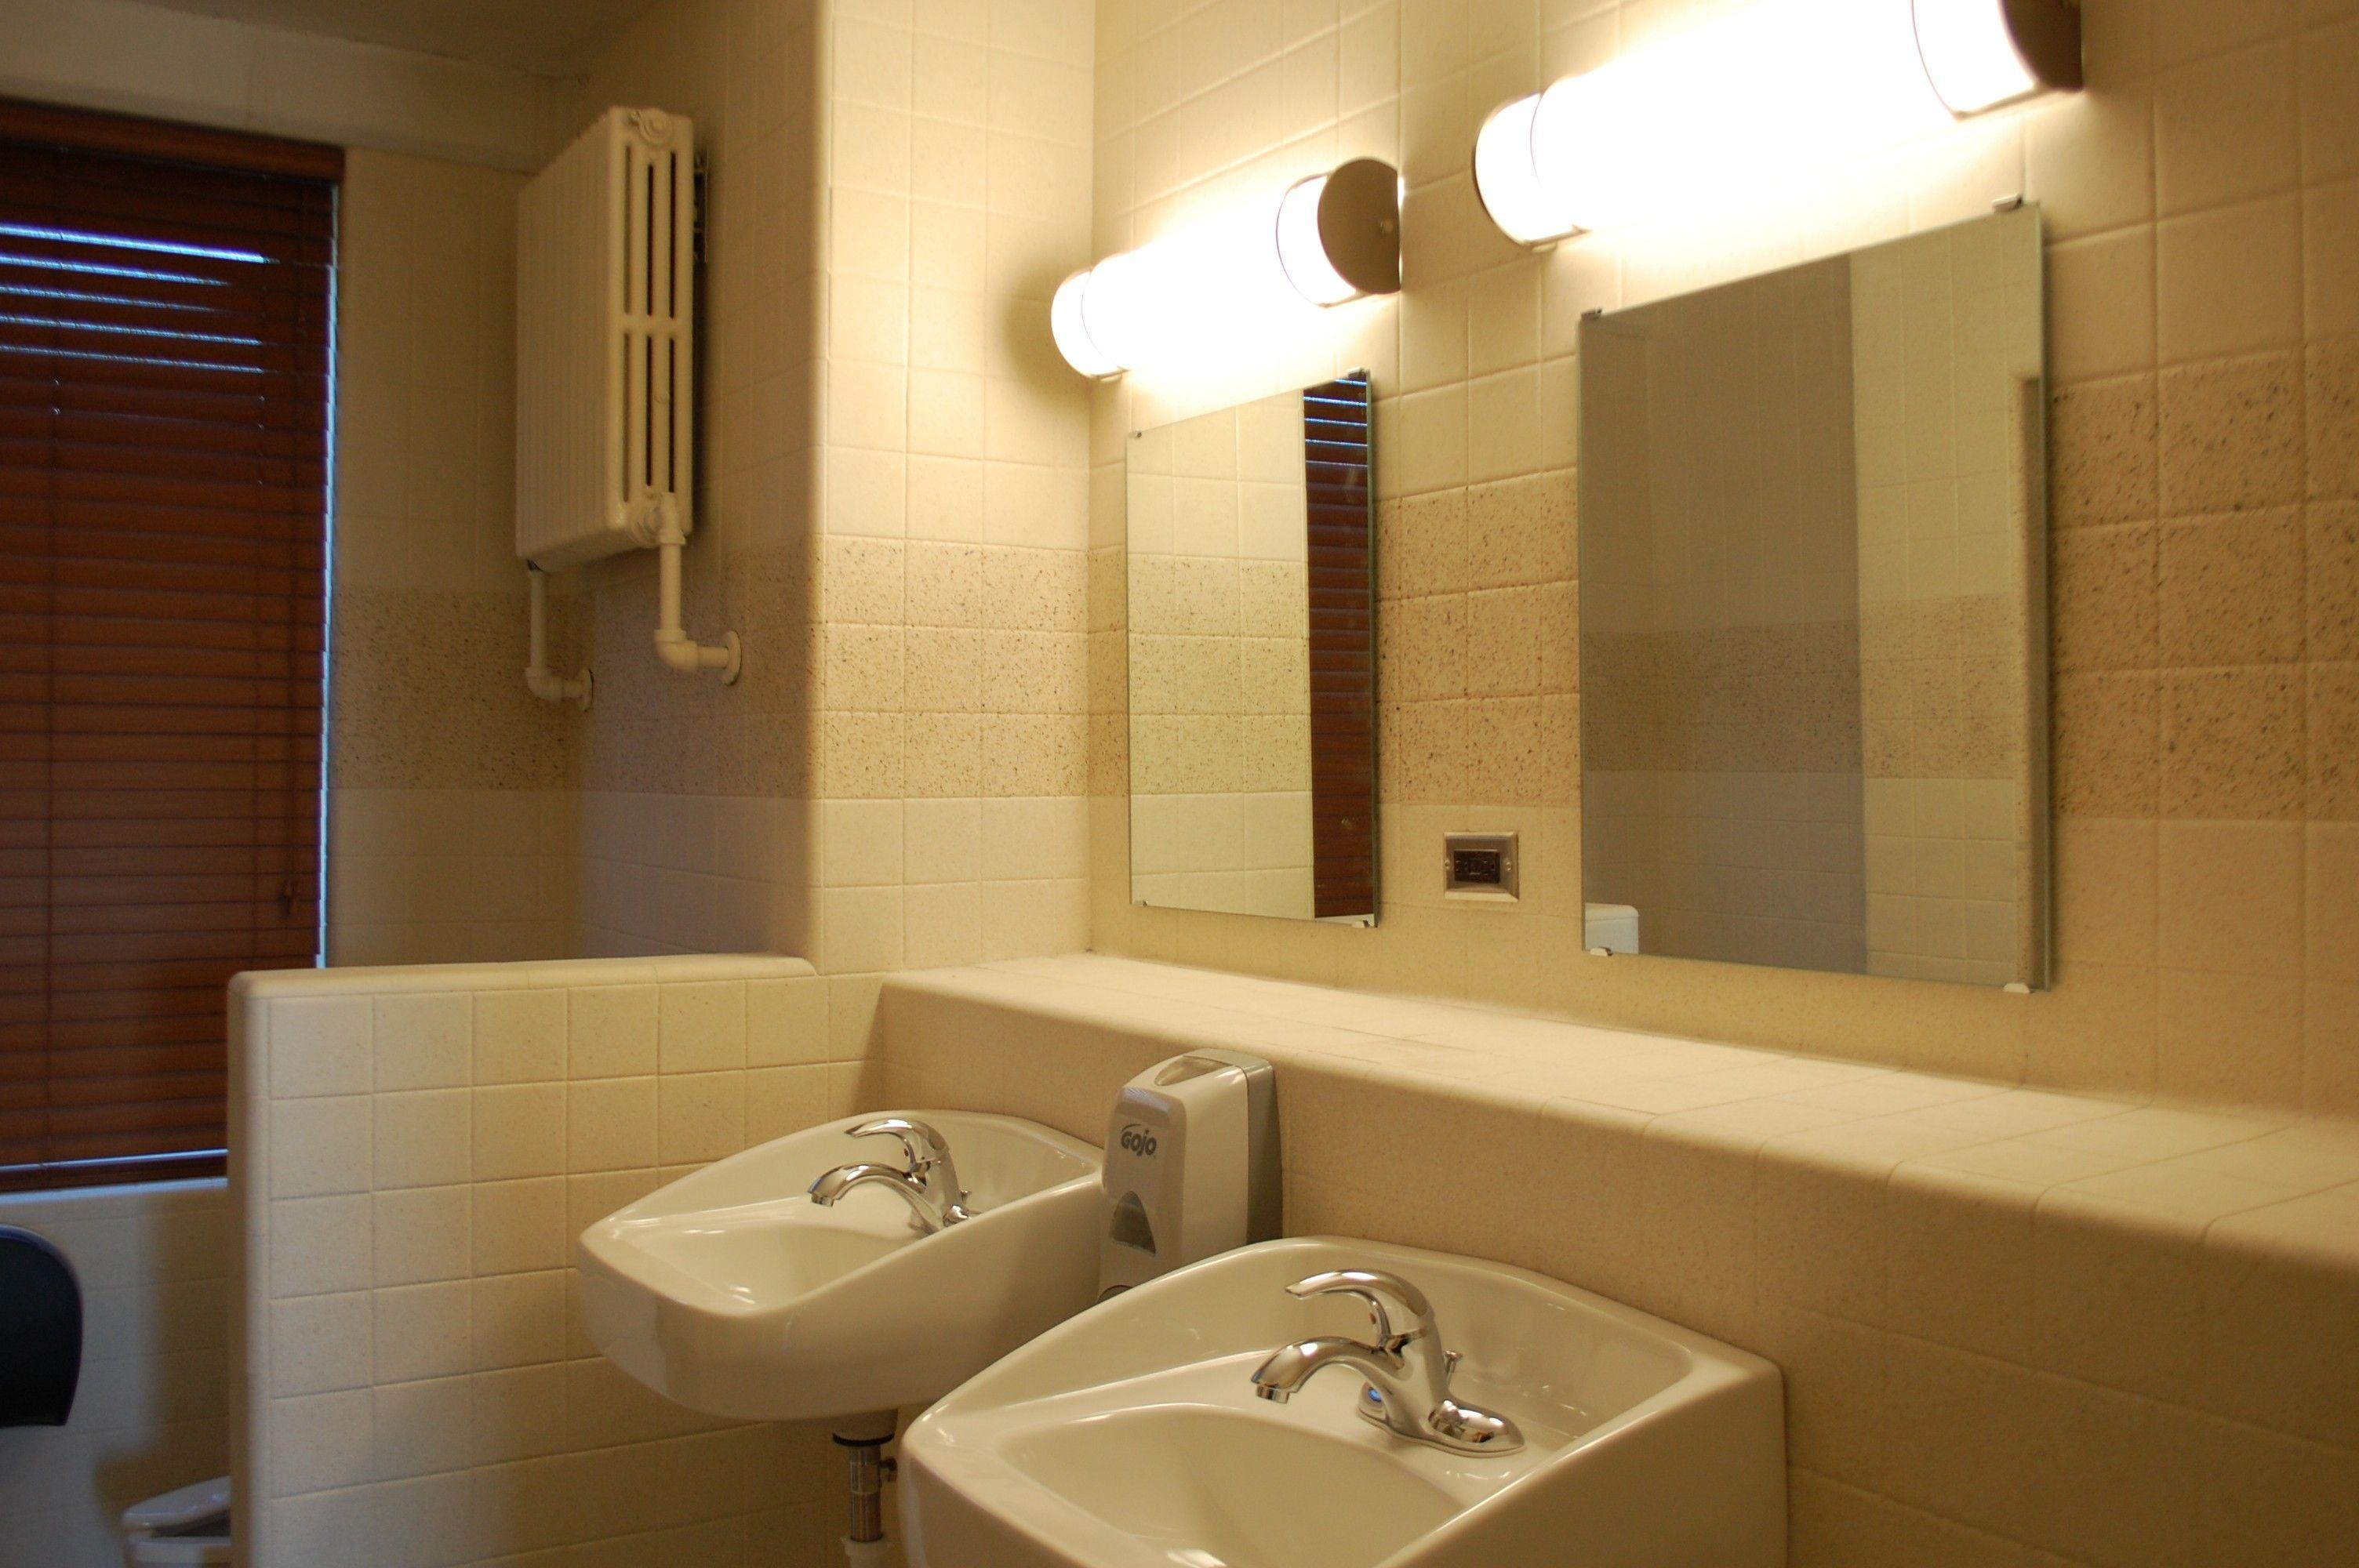 Fantastic Bathroom Lighting Ideas for Simple Bathroom with Clean ...